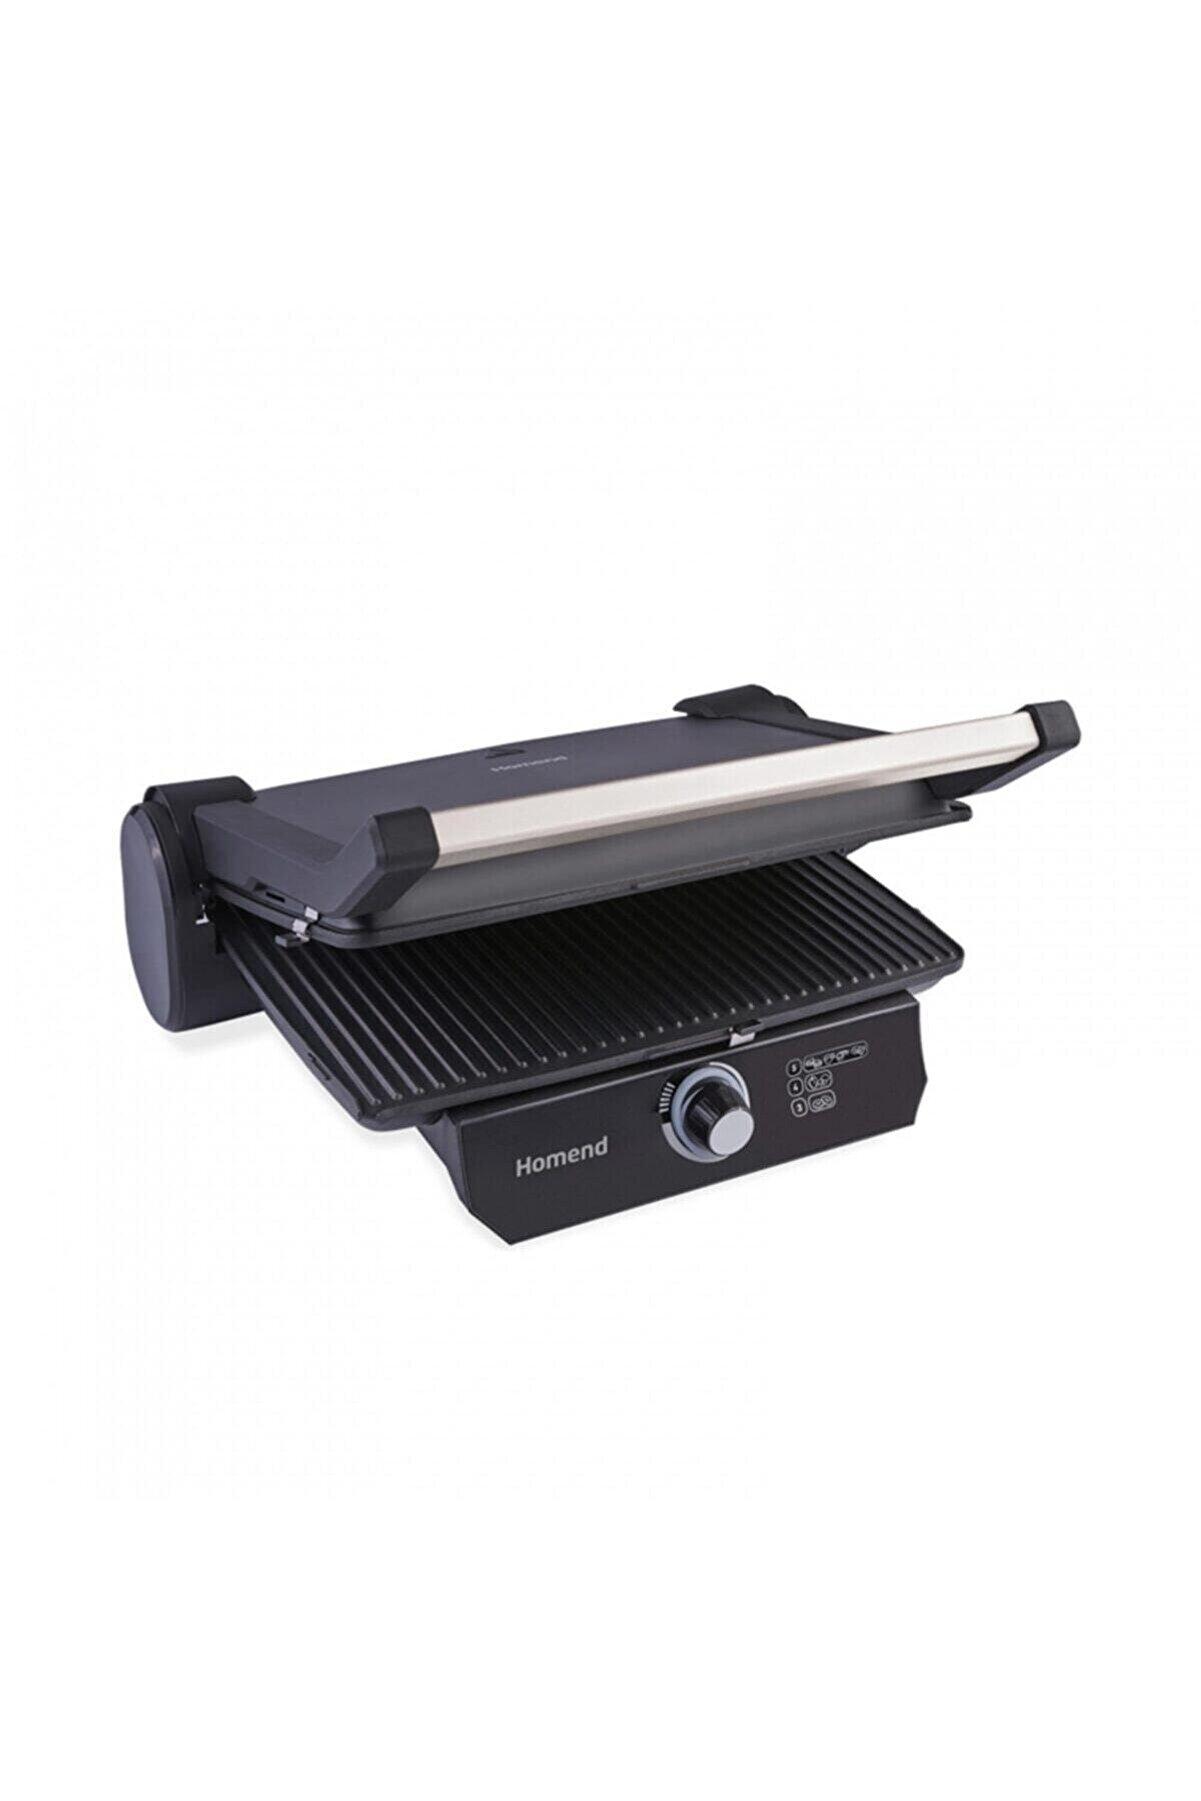 HOMEND Toastbuster 1334h Tost Makinesi Mat Siyah